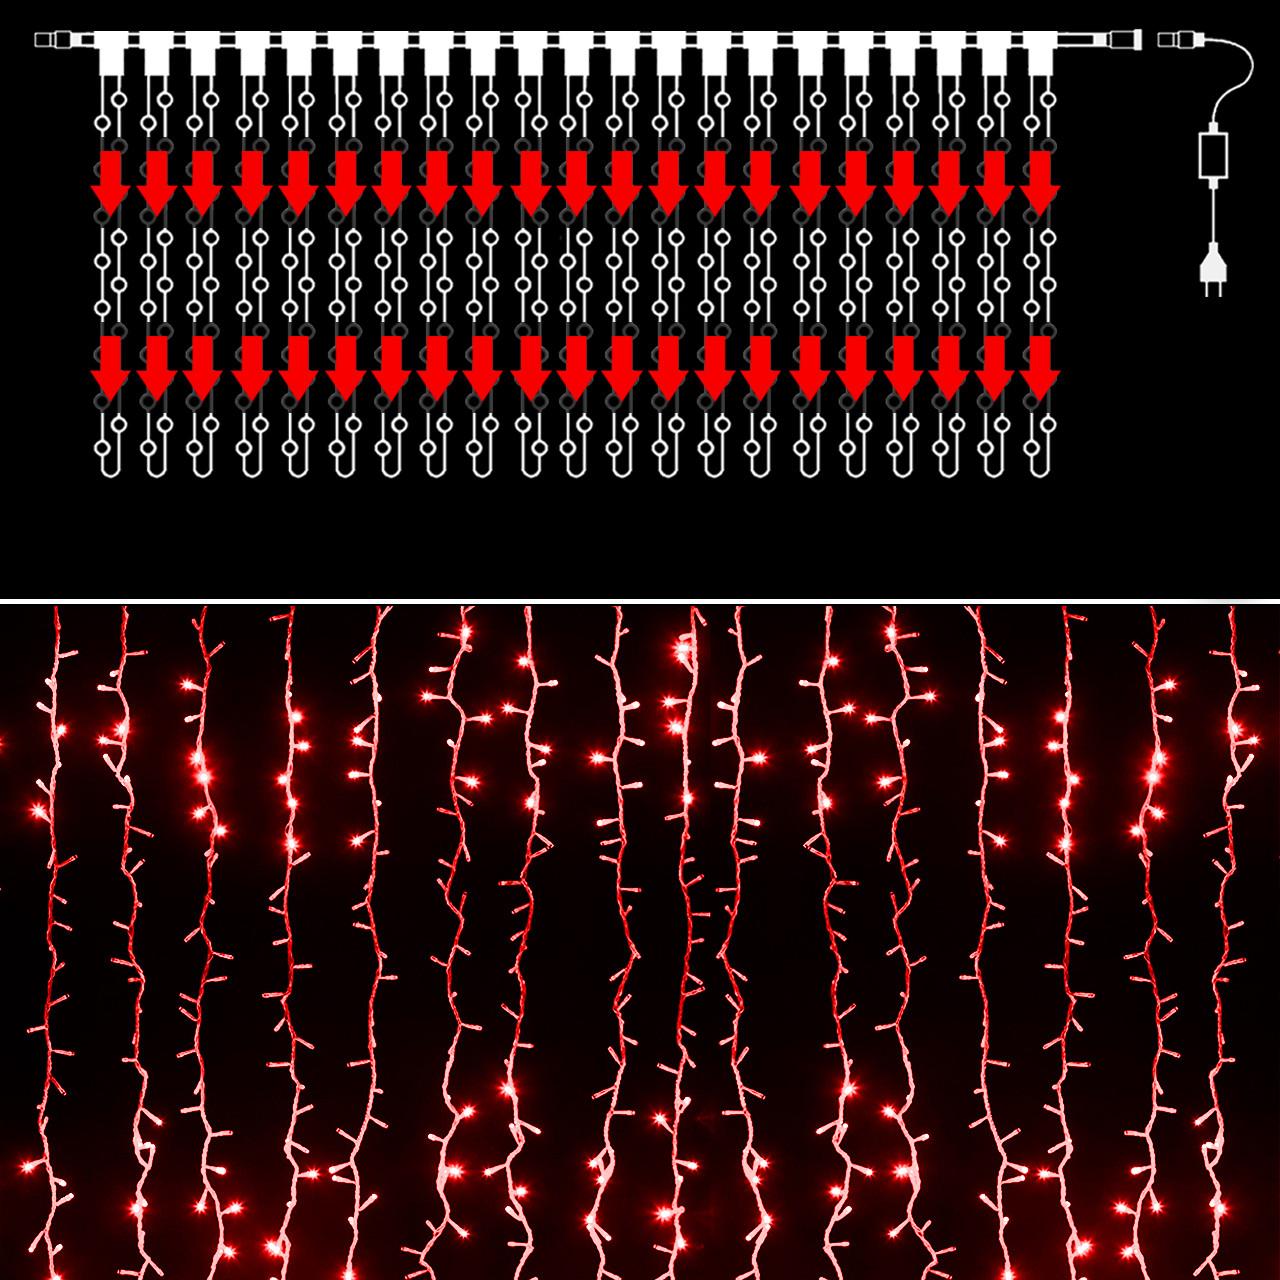 Уличная гирлянда водопад 560 светодиодов, 3 м*2 м, Красная(ВодУл_560/3*2Red)